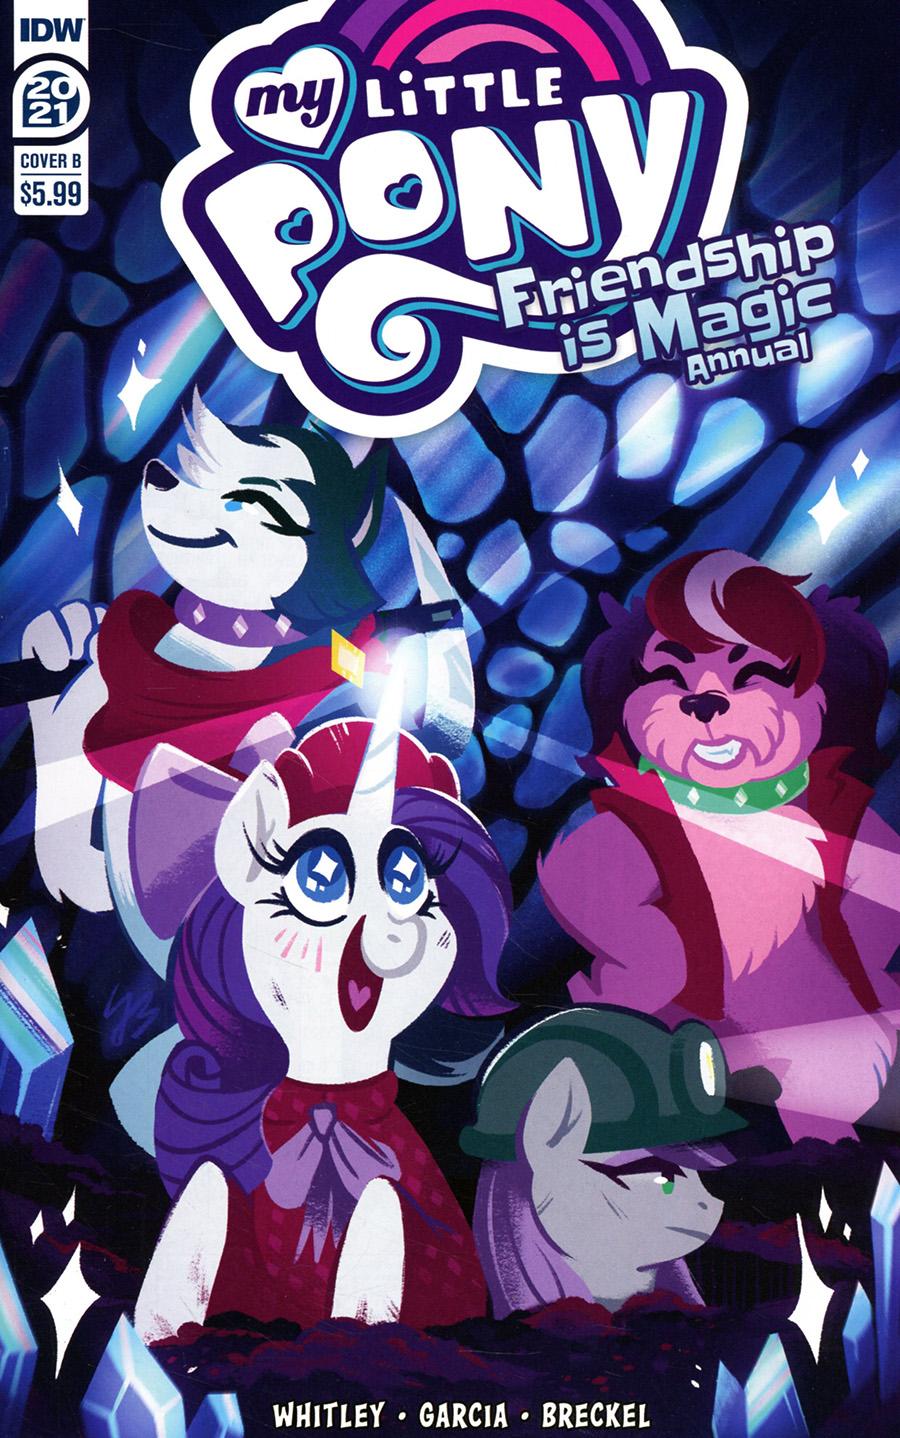 My Little Pony Friendship Is Magic Annual 2021 Cover B Variant JustaSuta Cover